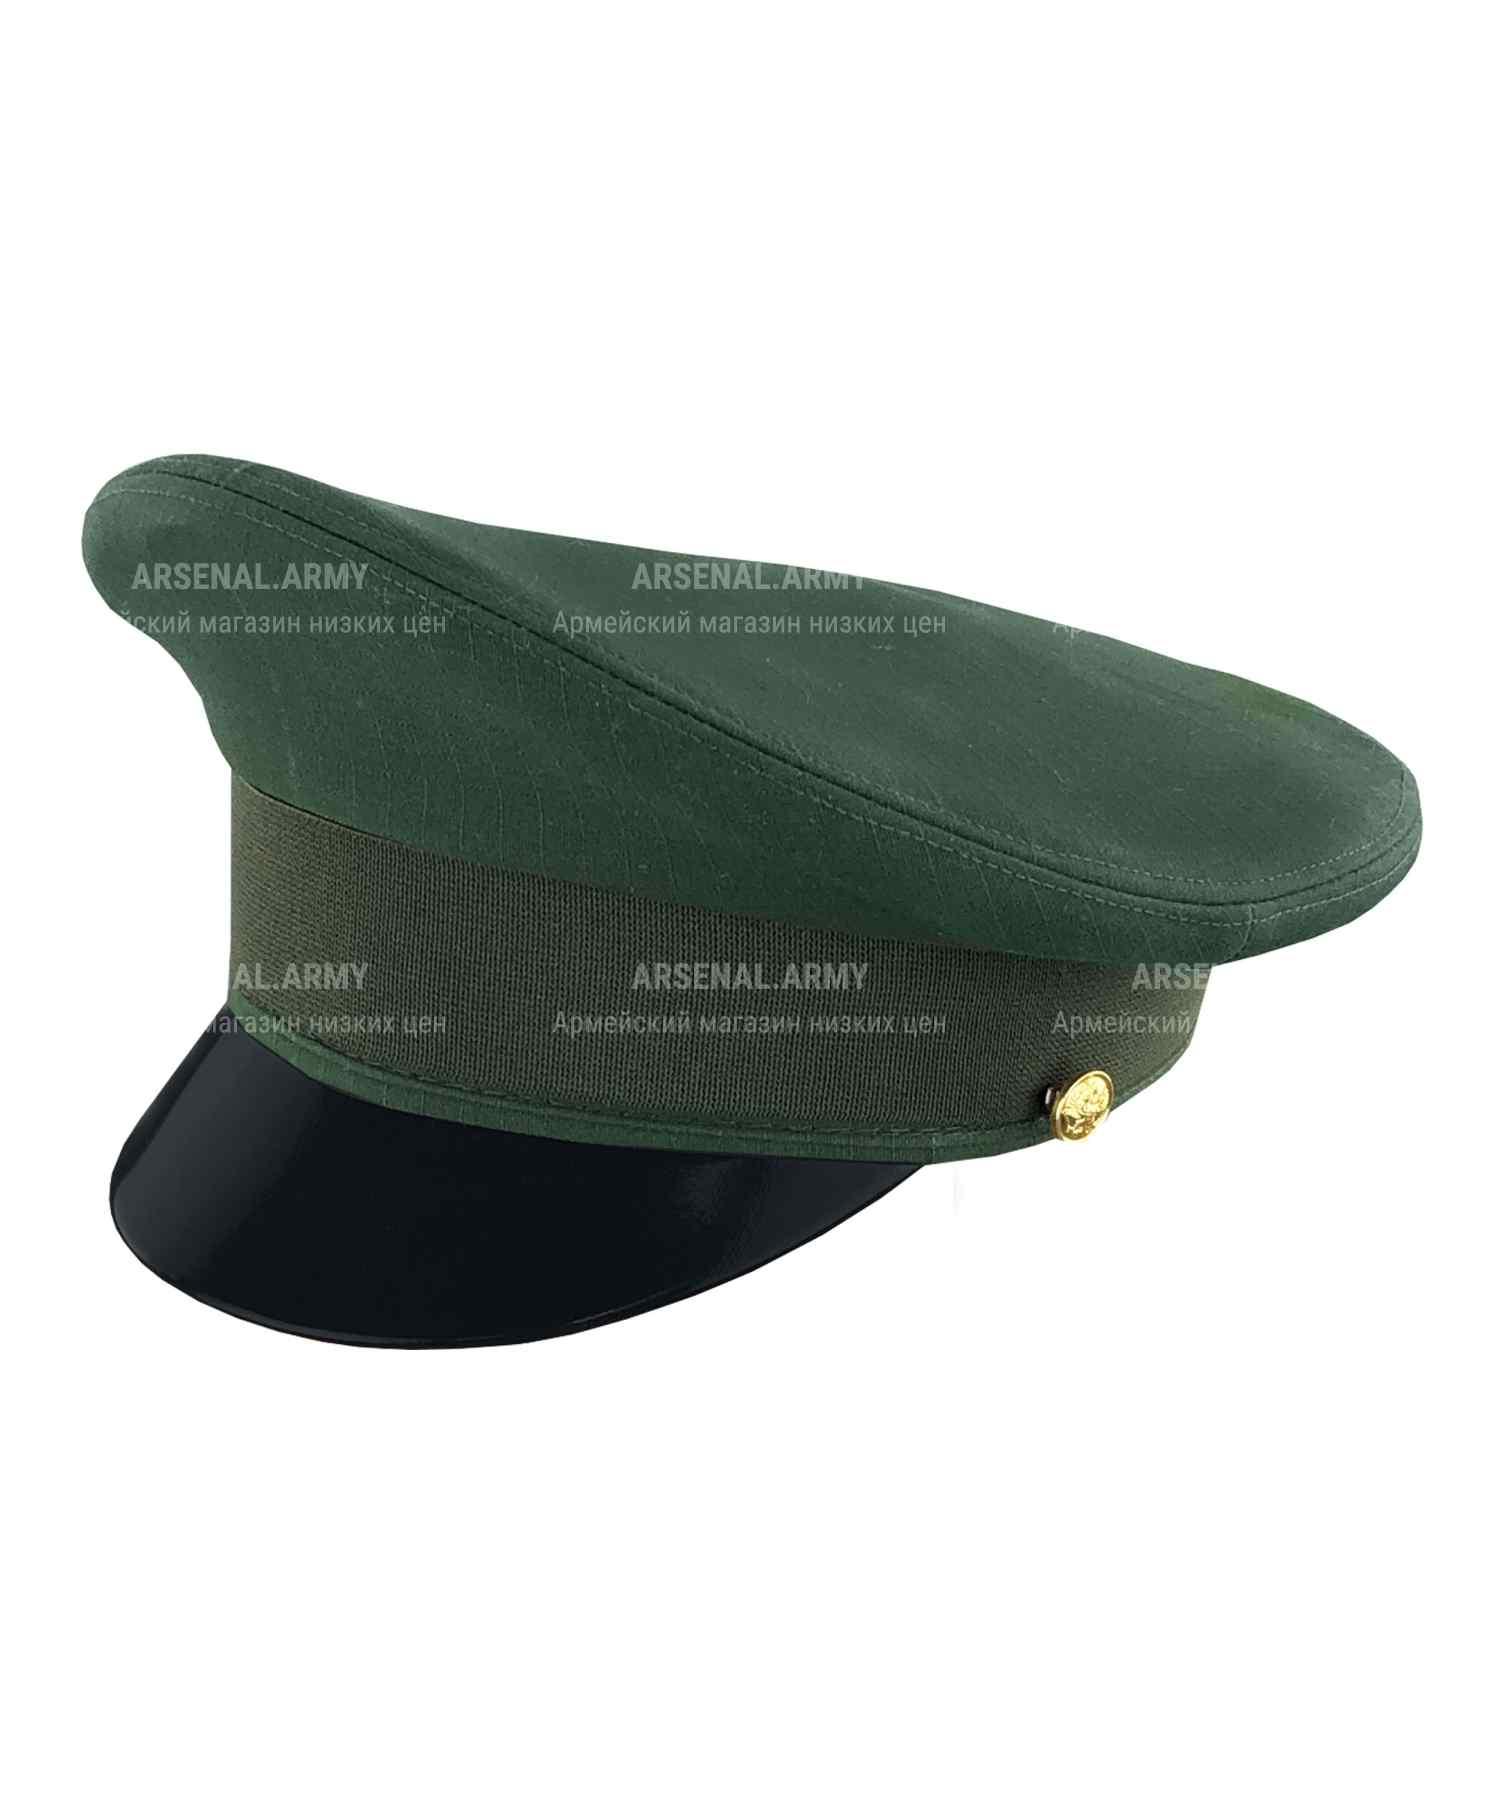 Фуражка офицерская штабная